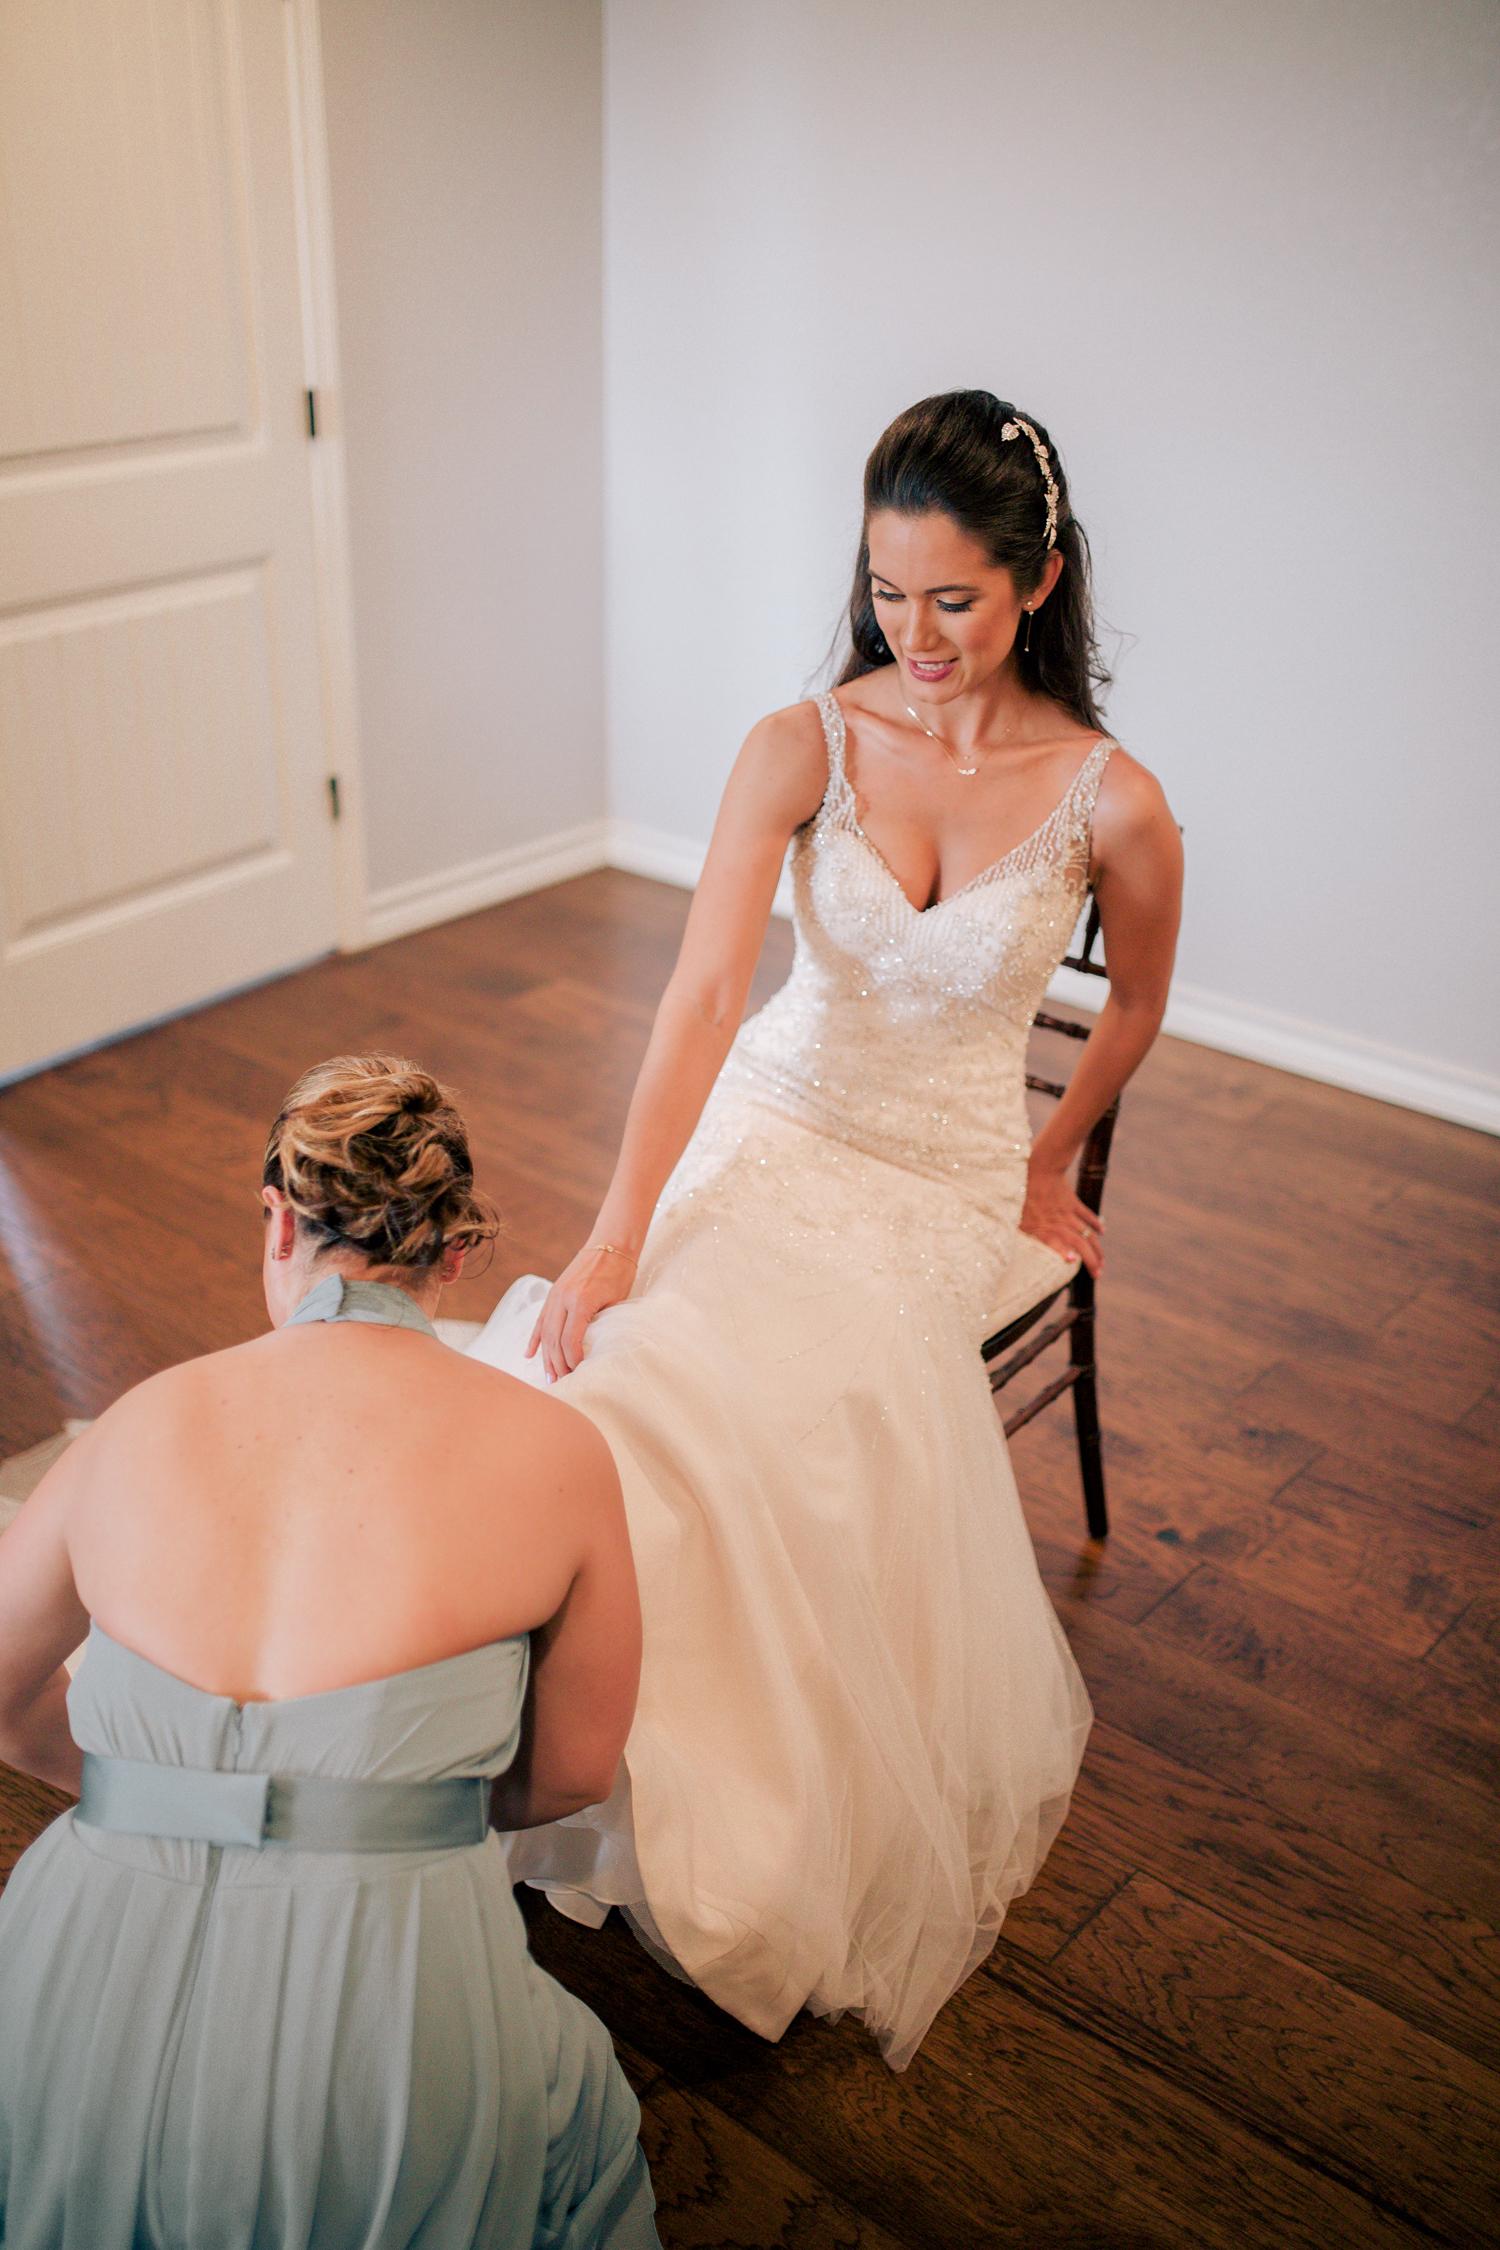 alaa-marzouk-photography-rgvweddingphotographer-rio-grande-valley-mathis-wedding-bridal-bride-san-antonio-portrait-weddings-mcallen-80.jpg